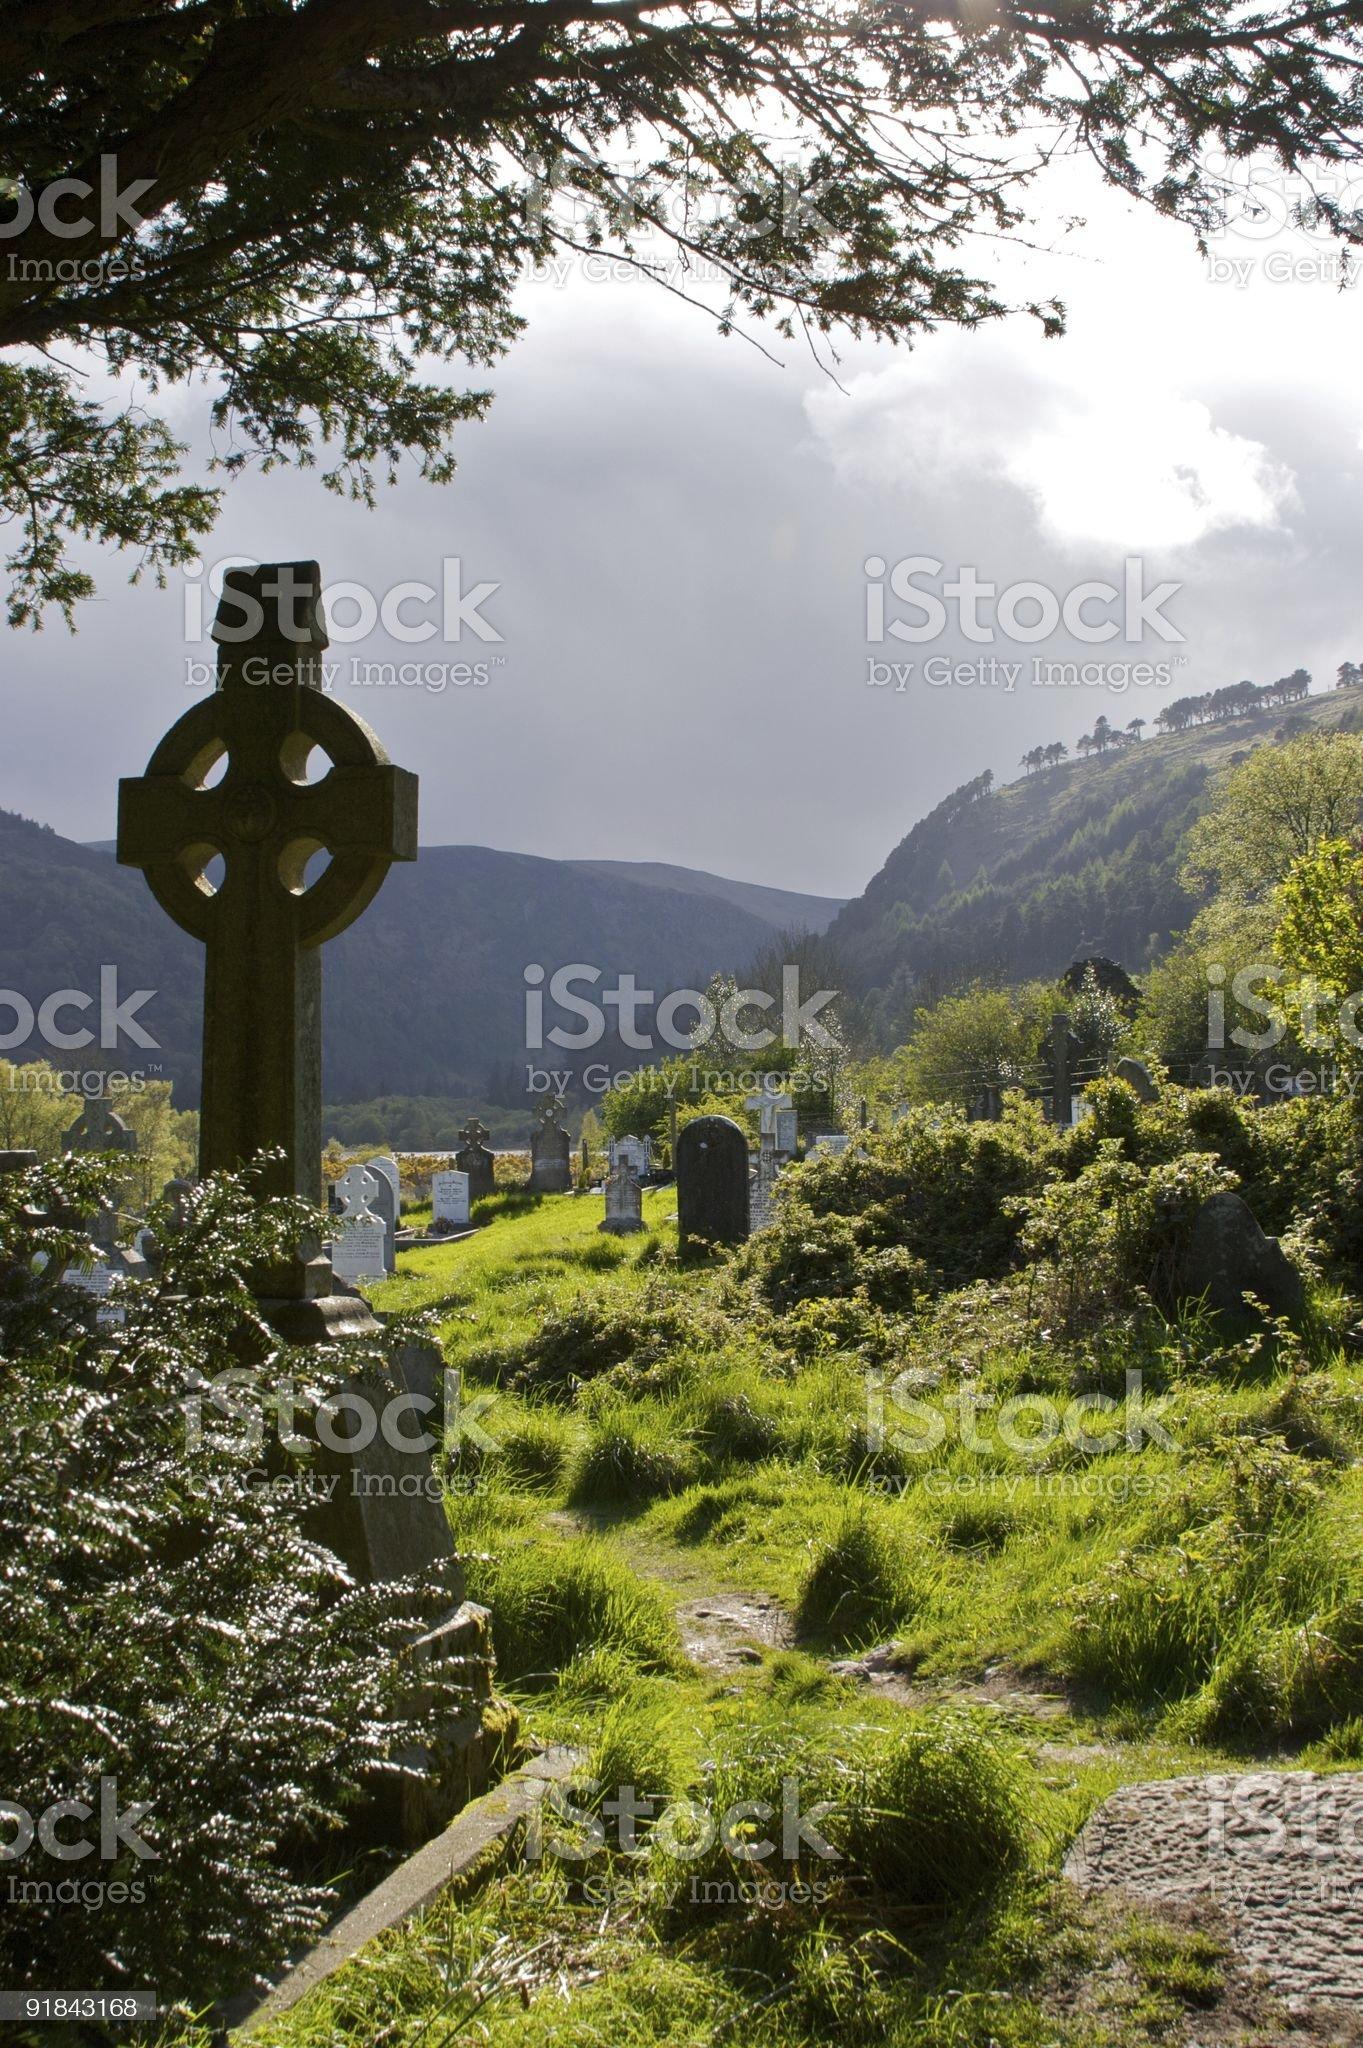 Celtic cross at Glendalough, Co. Wicklow, Ireland (Upright) royalty-free stock photo